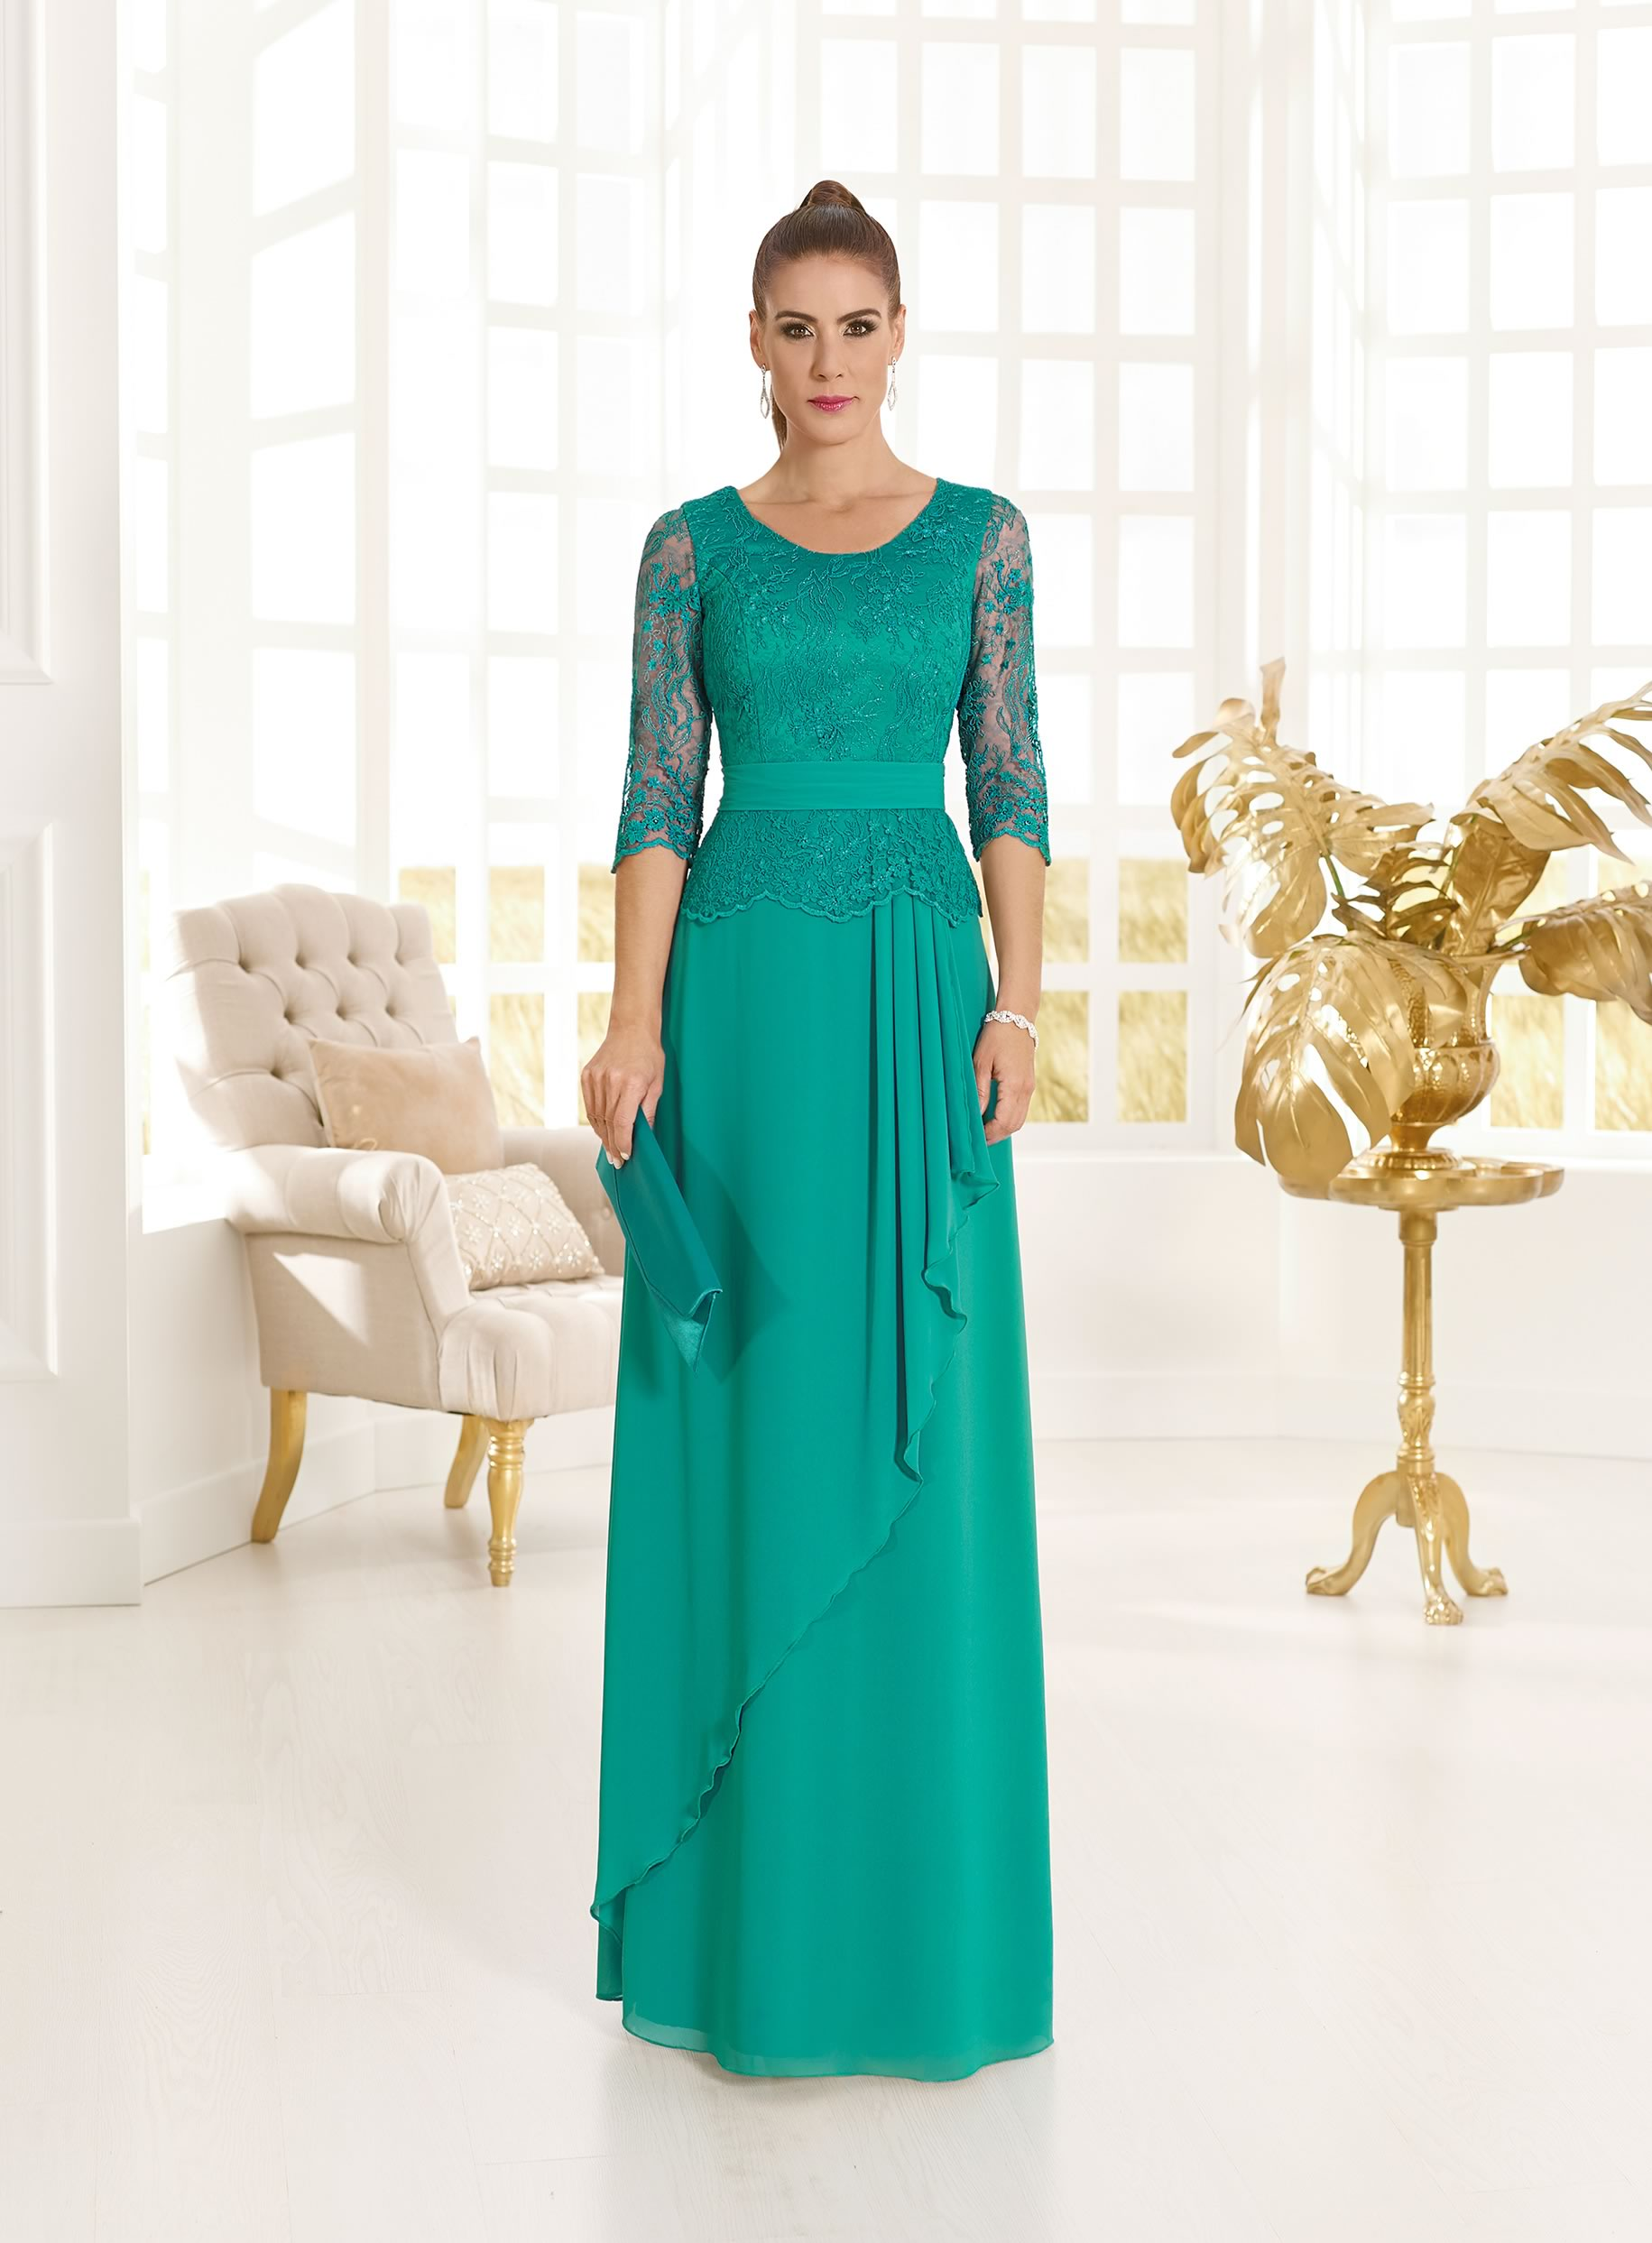 TodoBoda.com - 10 vestidos de fiesta para bodas de tarde-noche